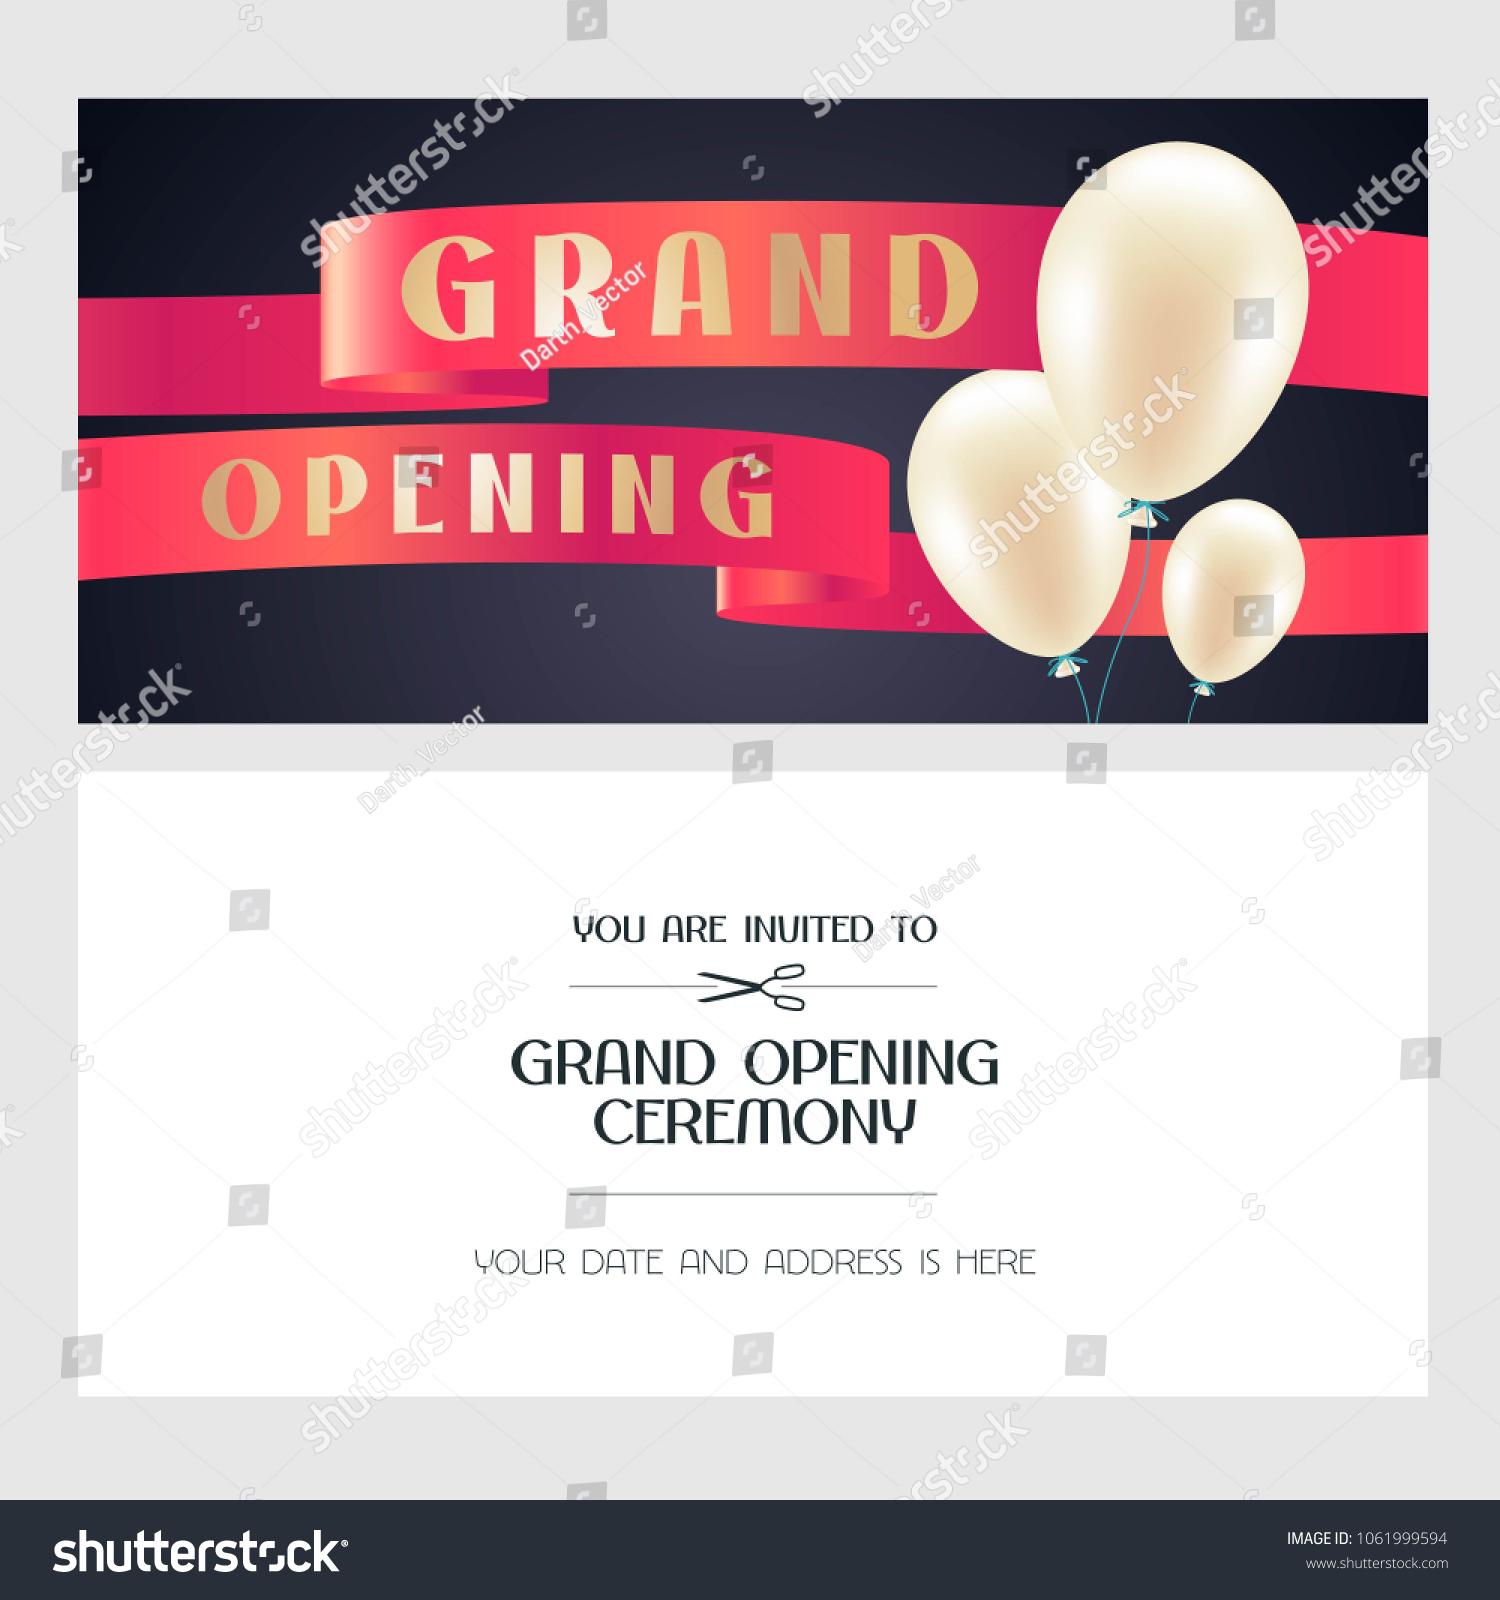 Grand Opening Vector Illustration Invitation Card Stock Vector